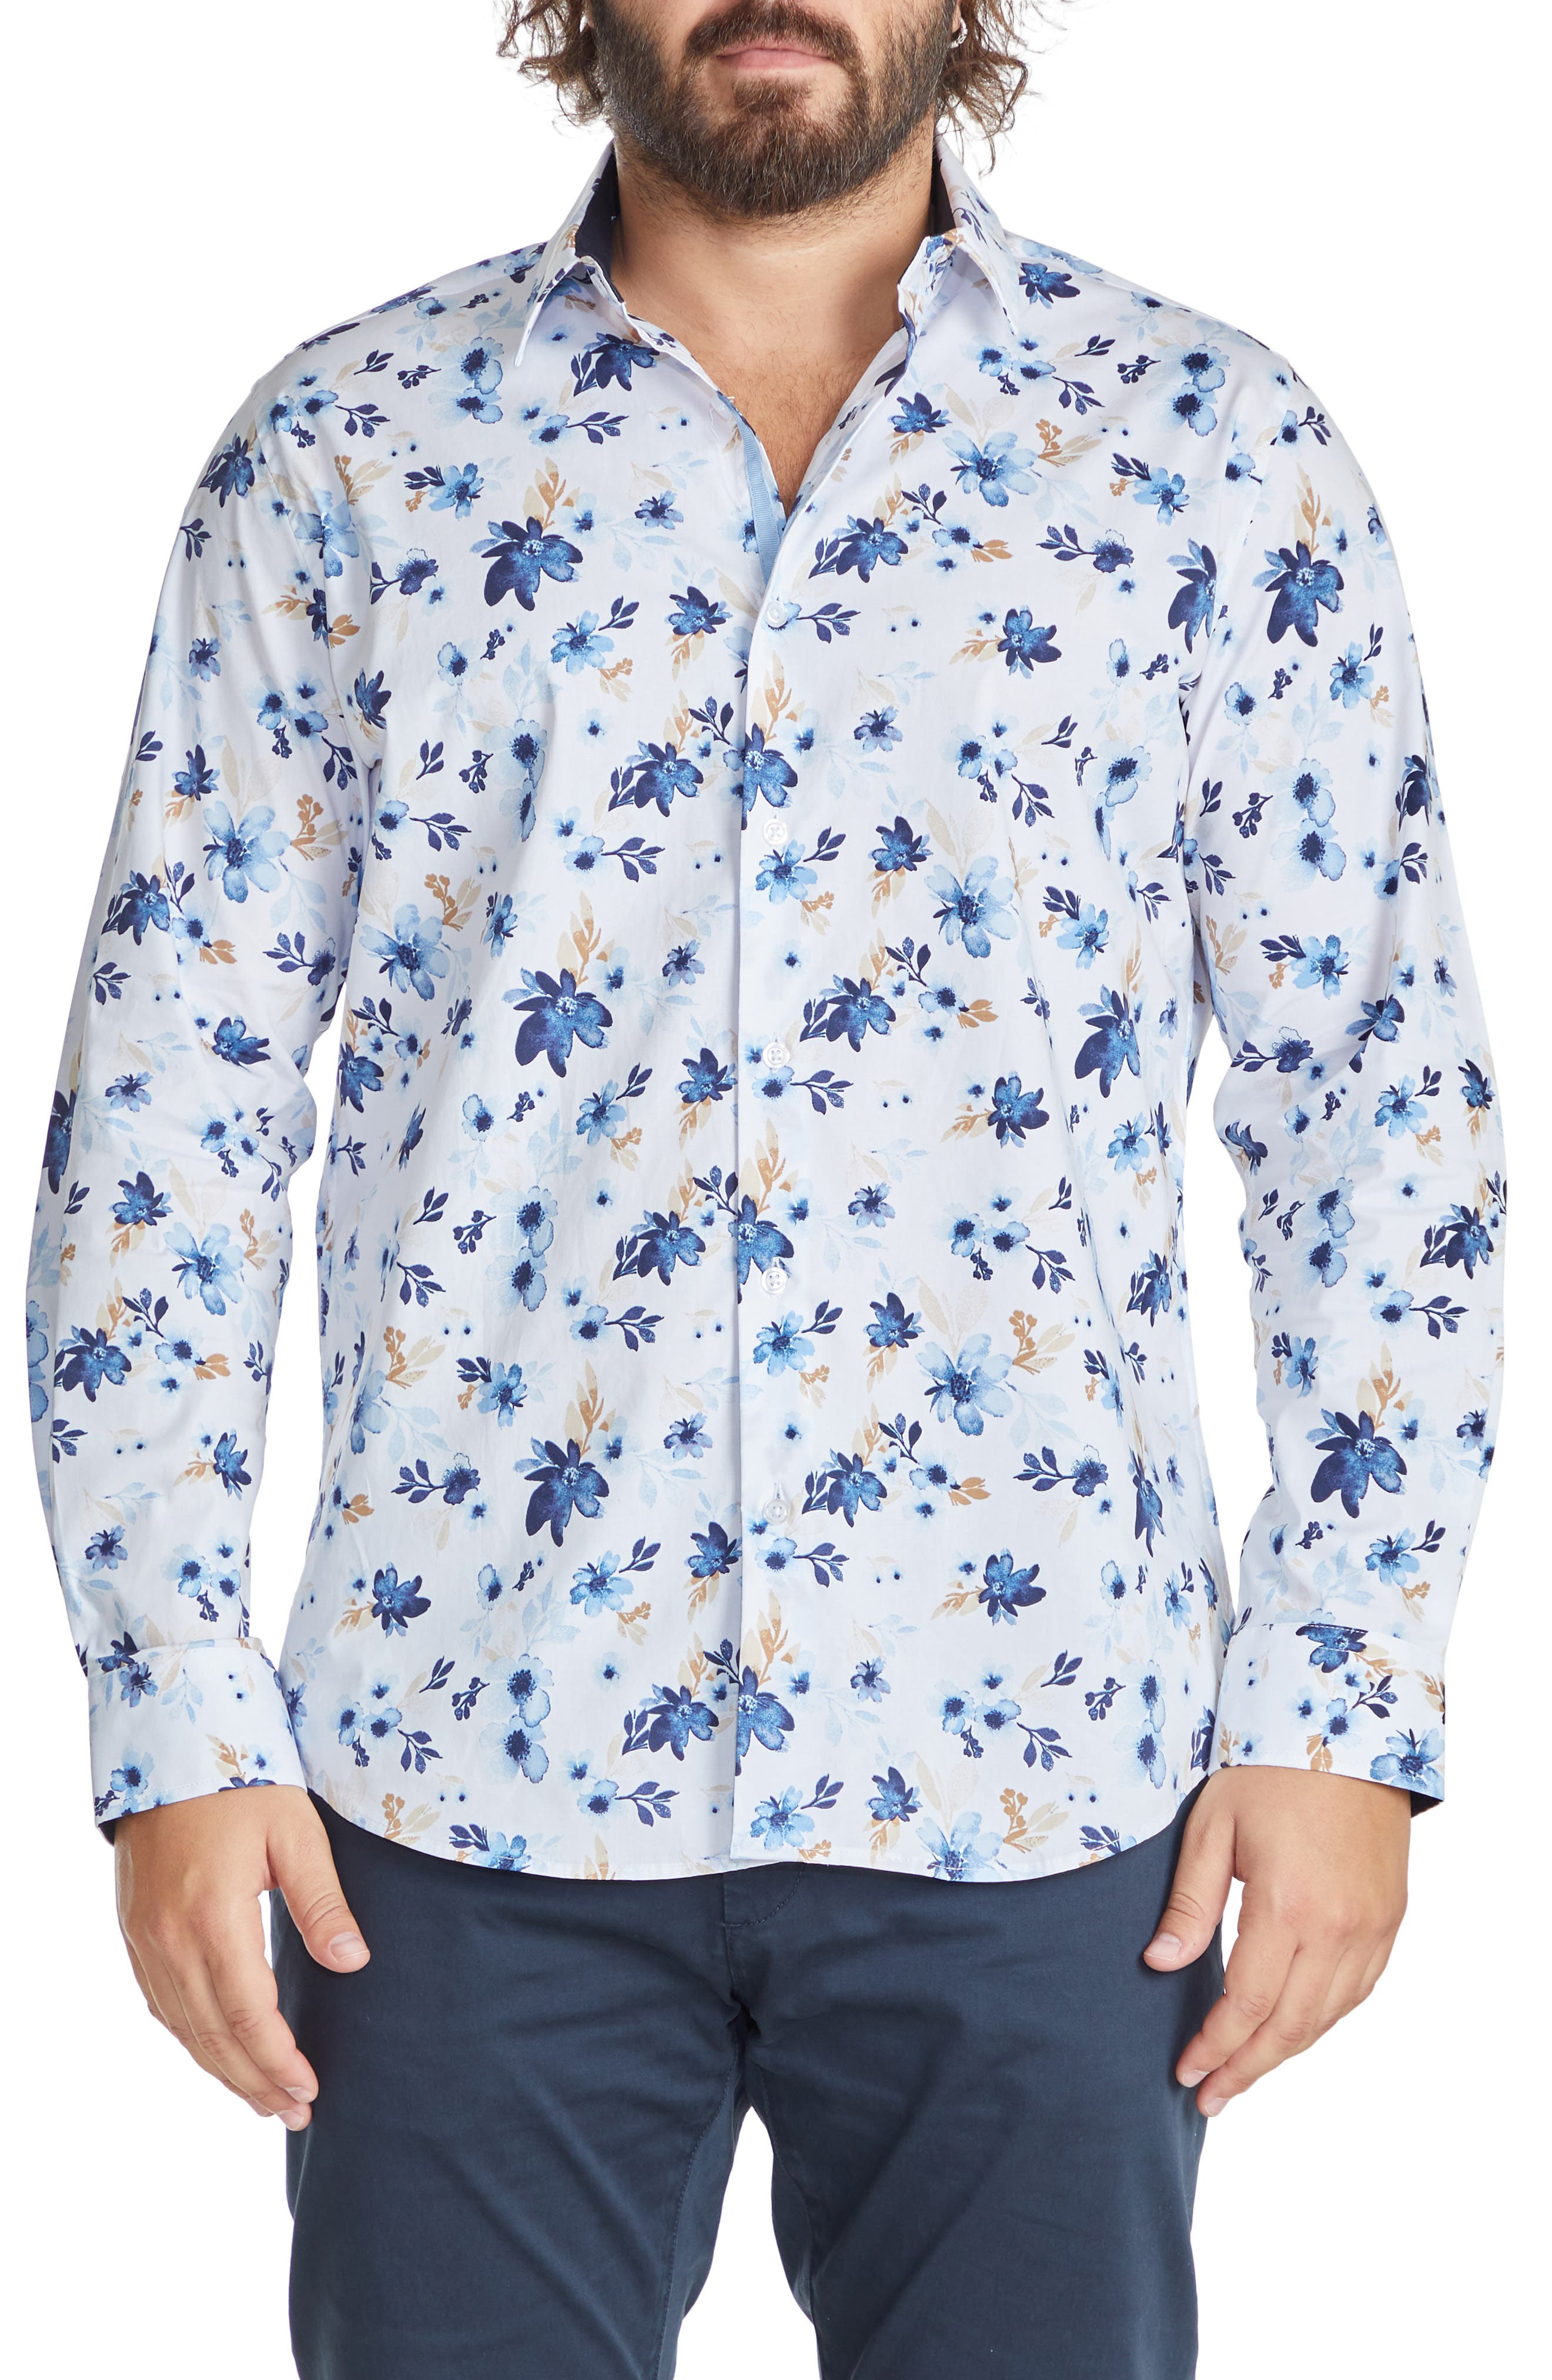 Watson Floral Print Stretch Cotton Button-Up Shirt